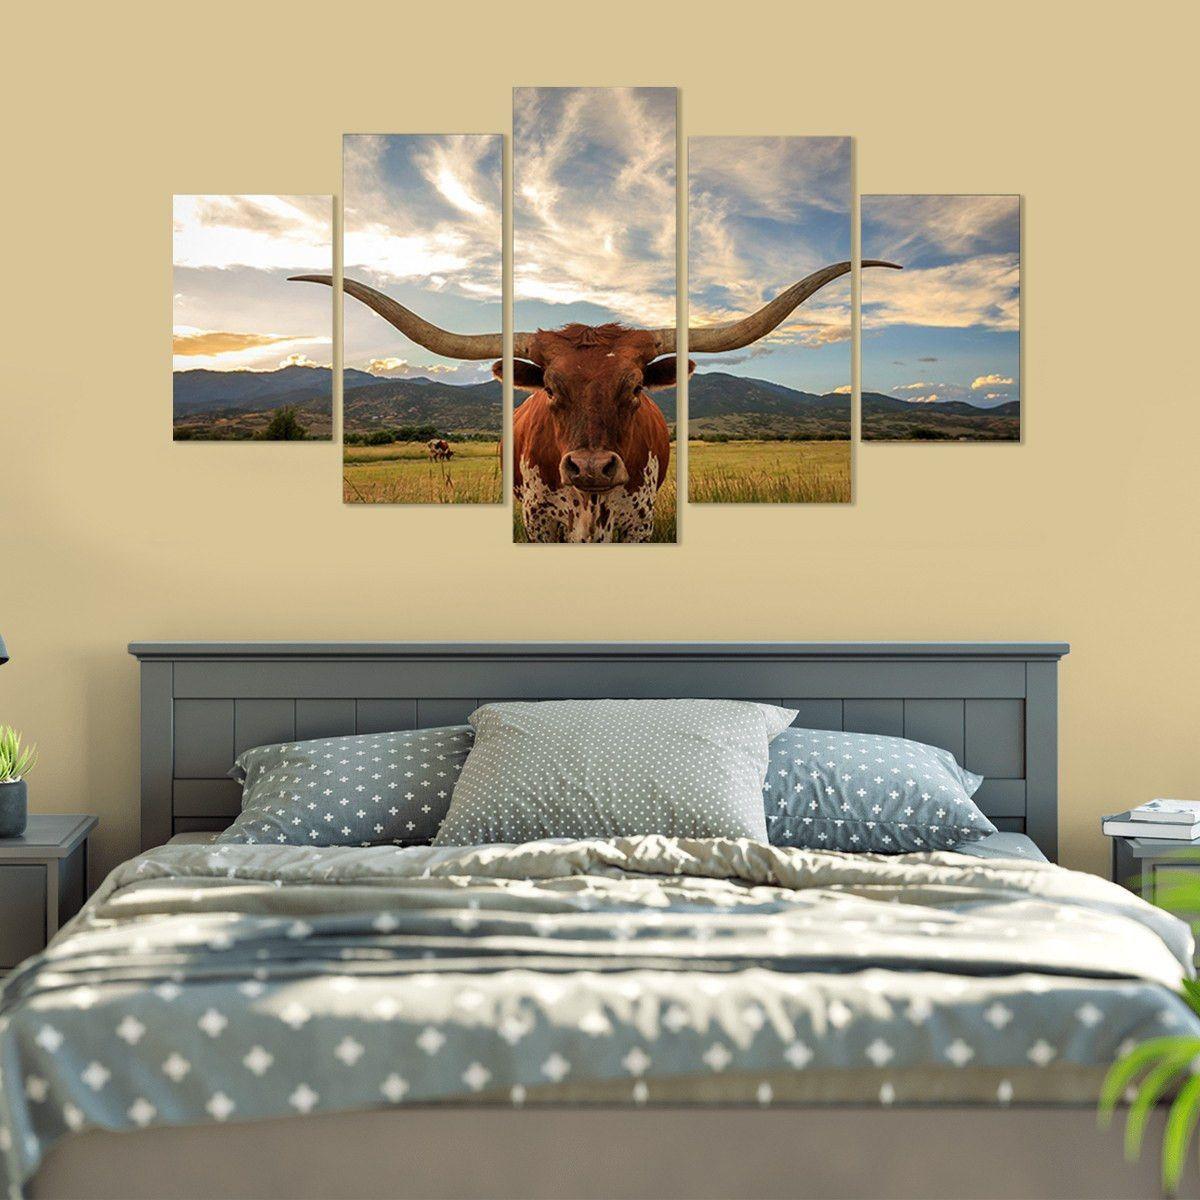 I Love Texas Longhorn Cattle 5 Piece Canvas Wall Art | Longhorn ...